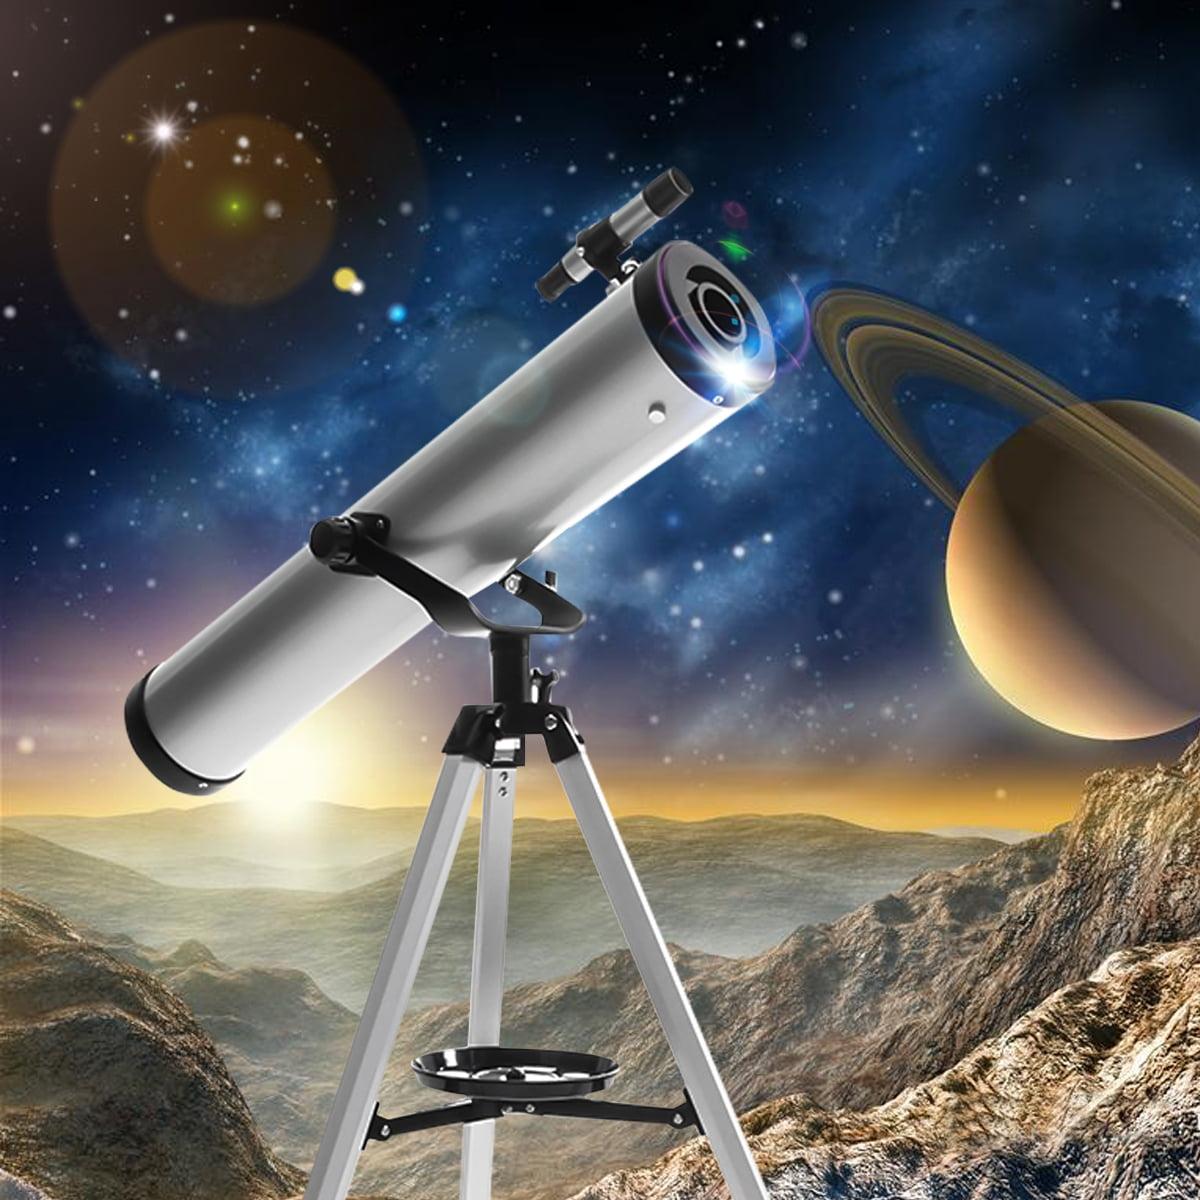 Outdoor Telescope 525X  F76700  Astronomical Telescope 700/76mm Refractor Monocular Kid Christmas Birthday Gift Spotting Scope